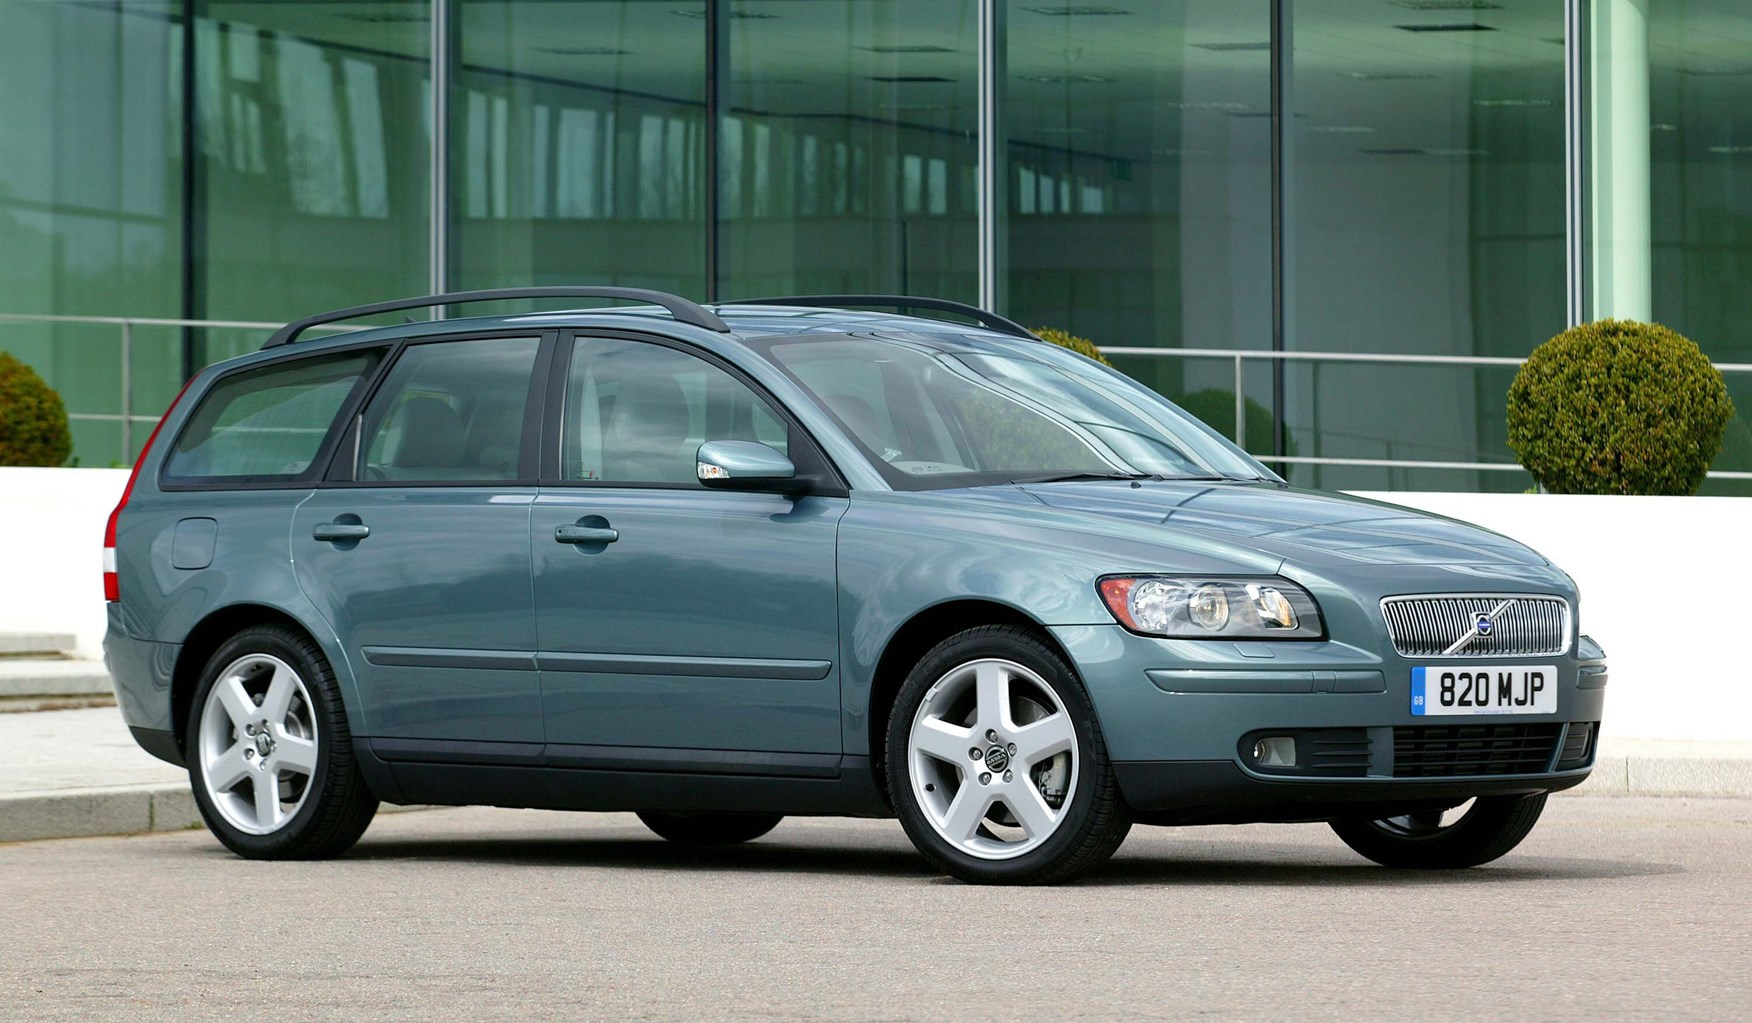 Volvo V50 Estate Review (2004 - 2012) | Parkers